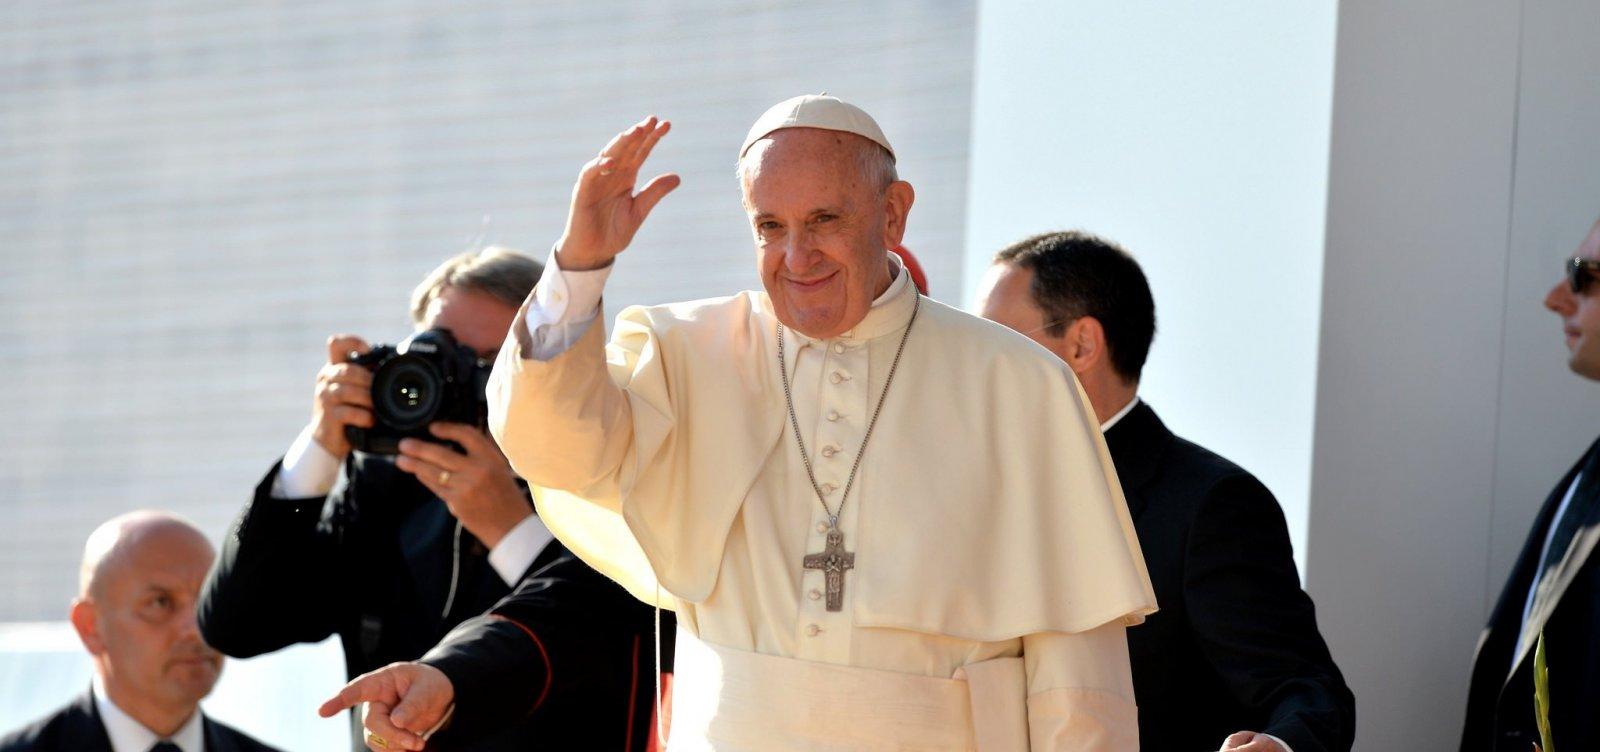 [Papa expressa solidariedade aos atingidos por terremoto na Indonésia]